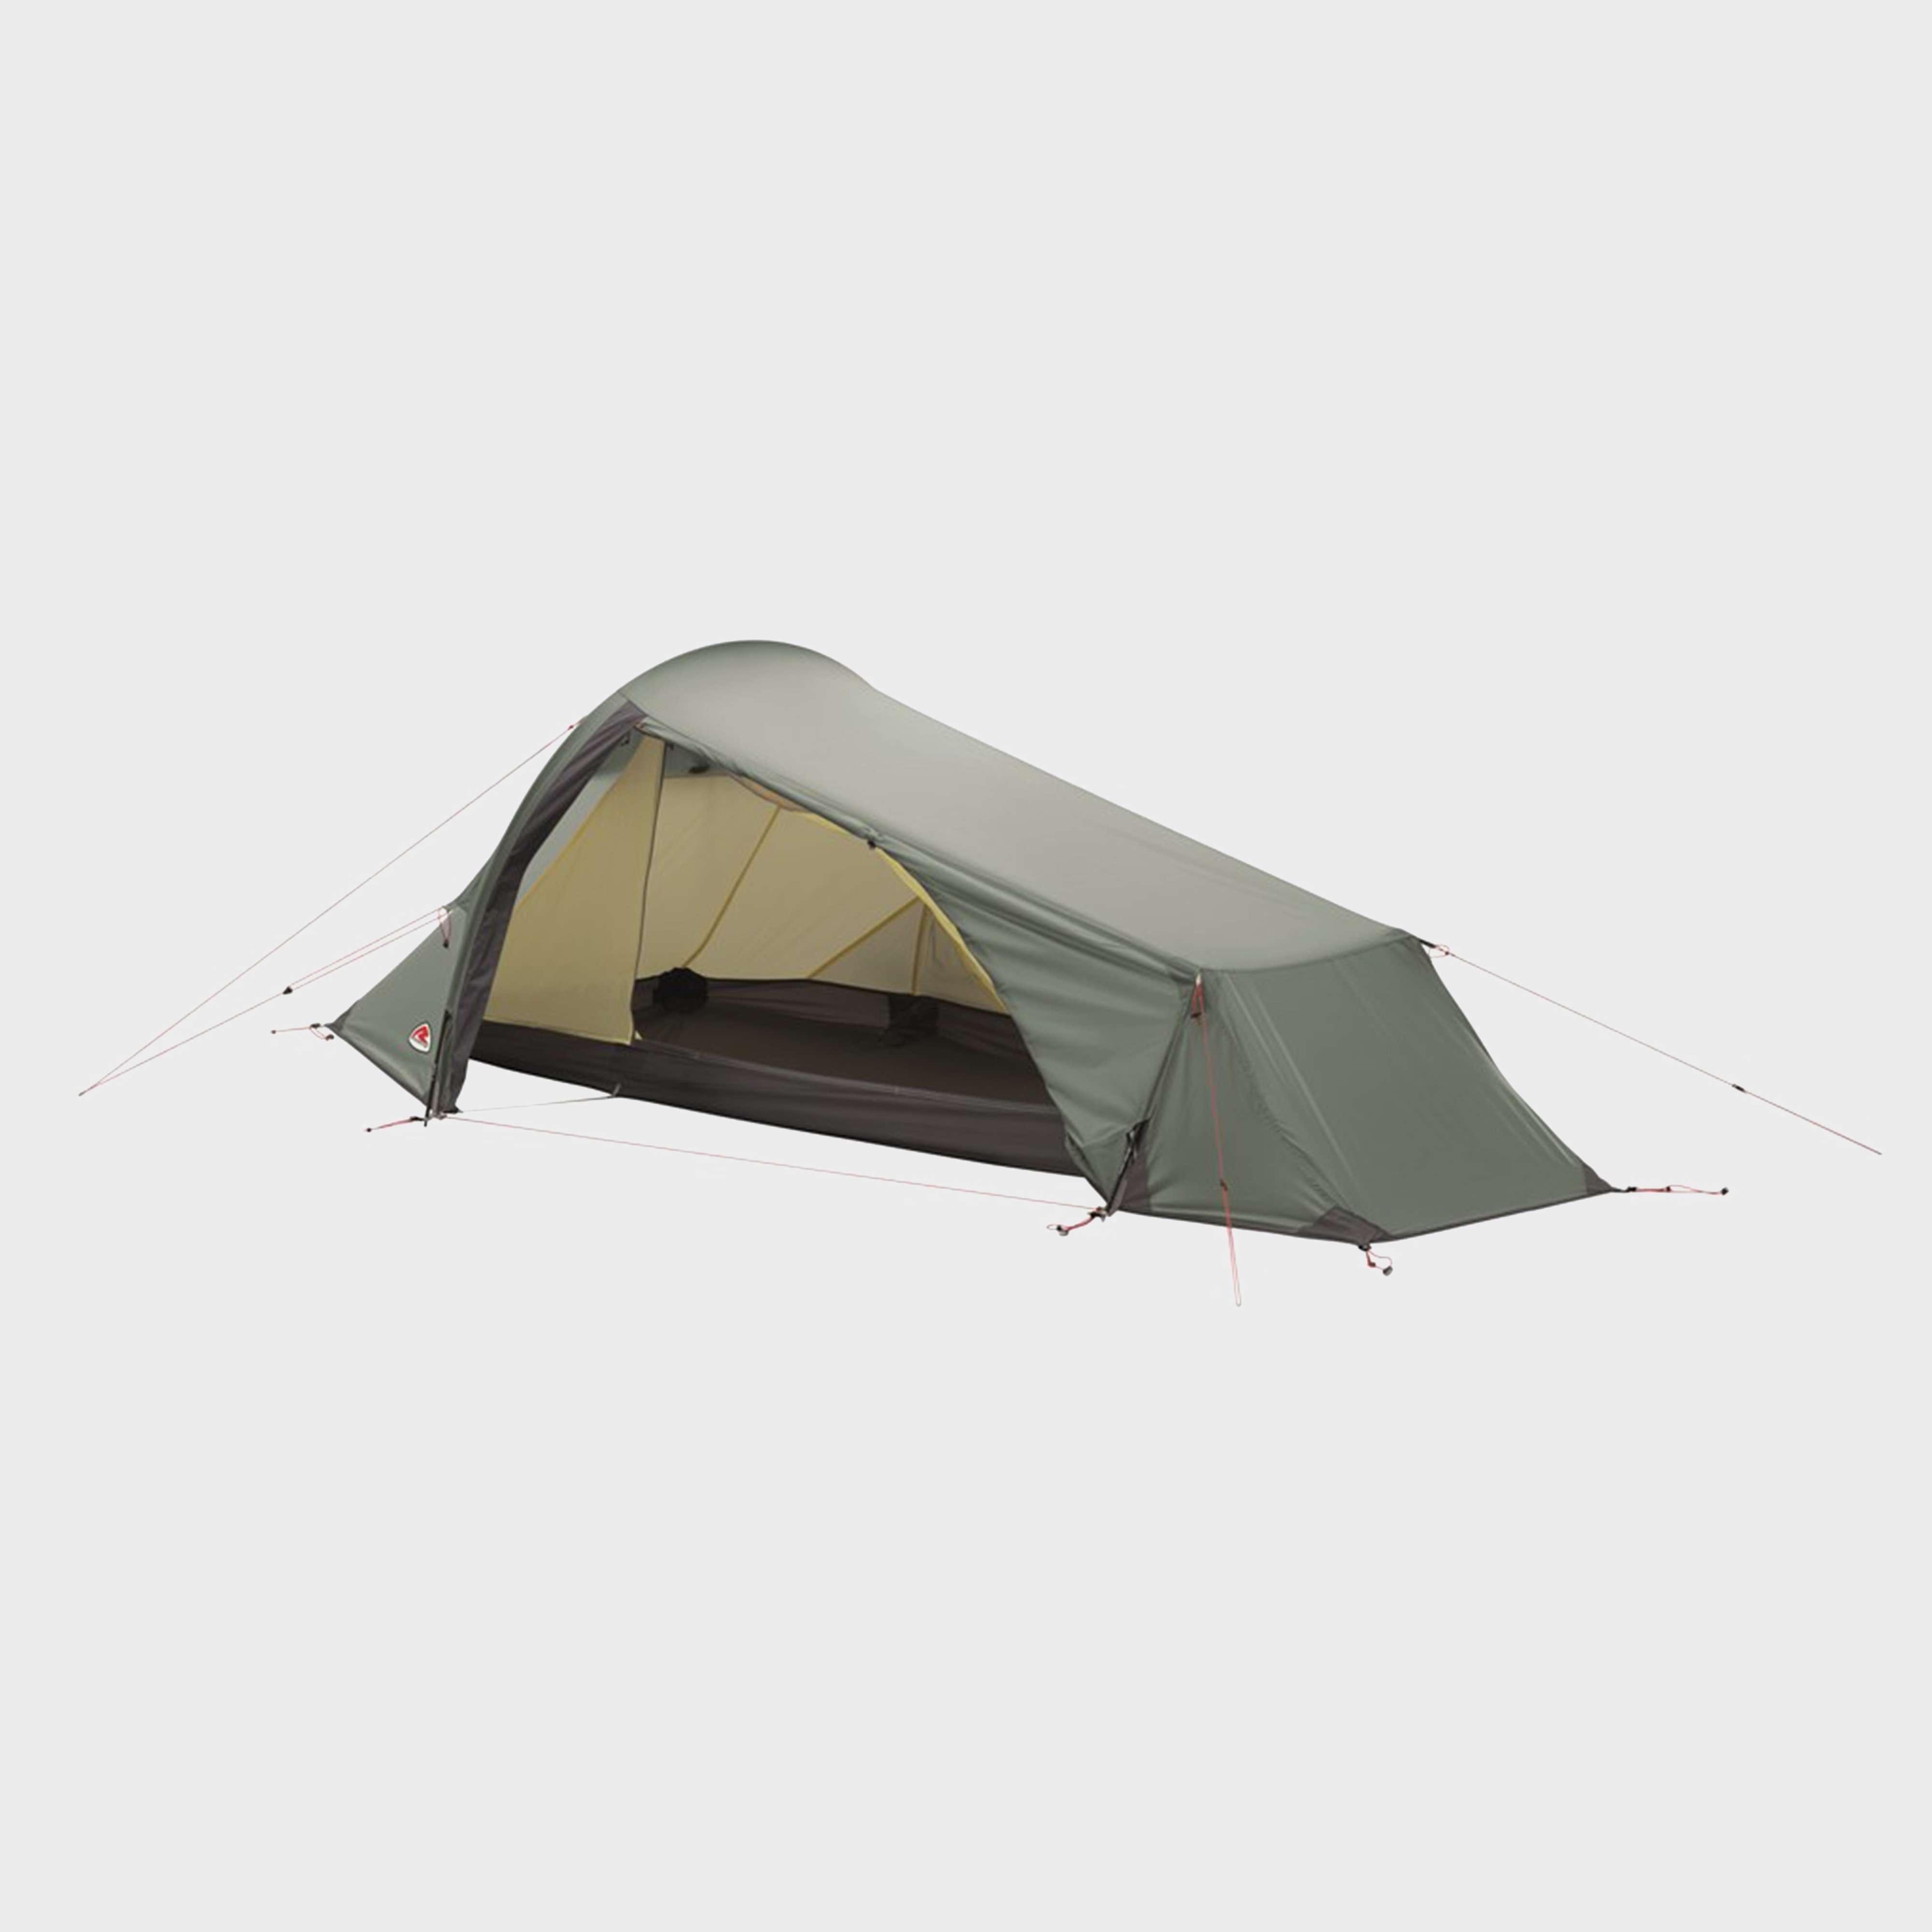 ROBENS Goldcrest 1 Person Tent